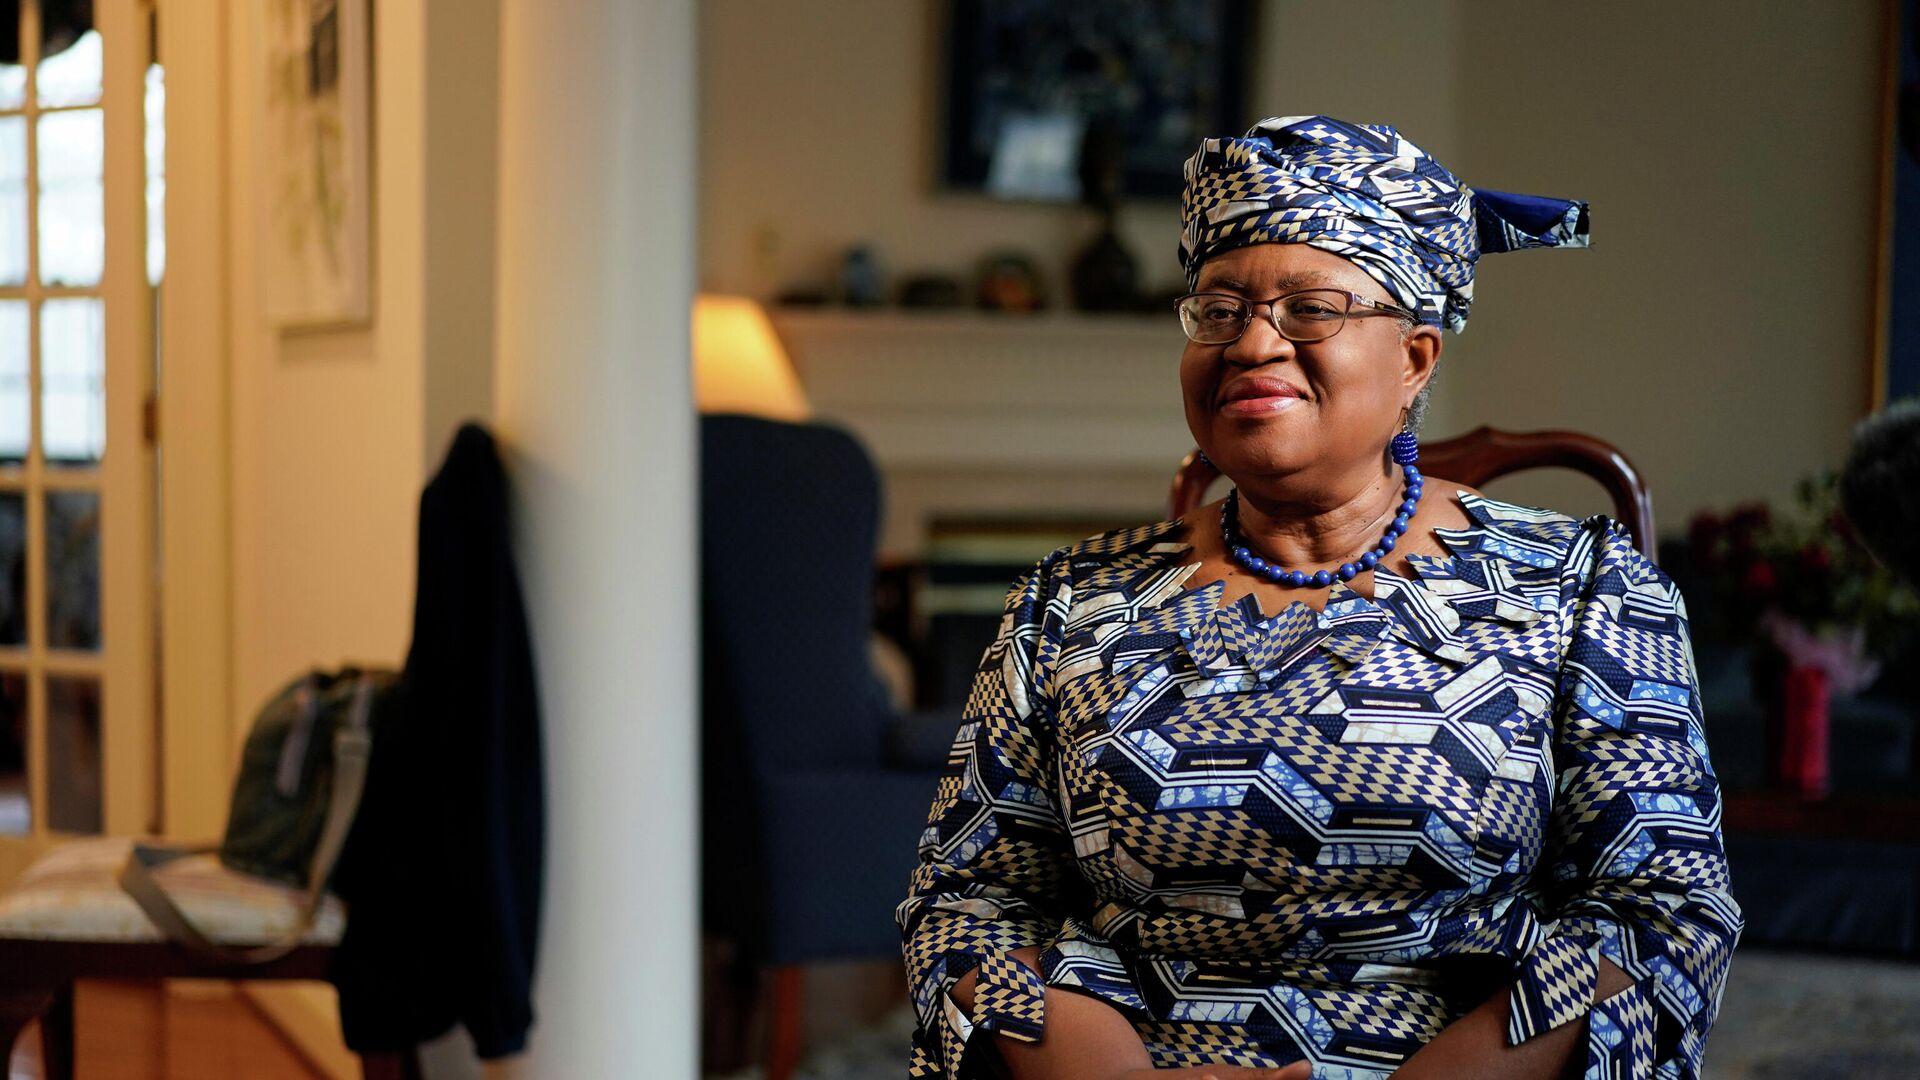 Ngozi Okonjo-Iweala, directora general de la OMC - Sputnik Mundo, 1920, 15.02.2021